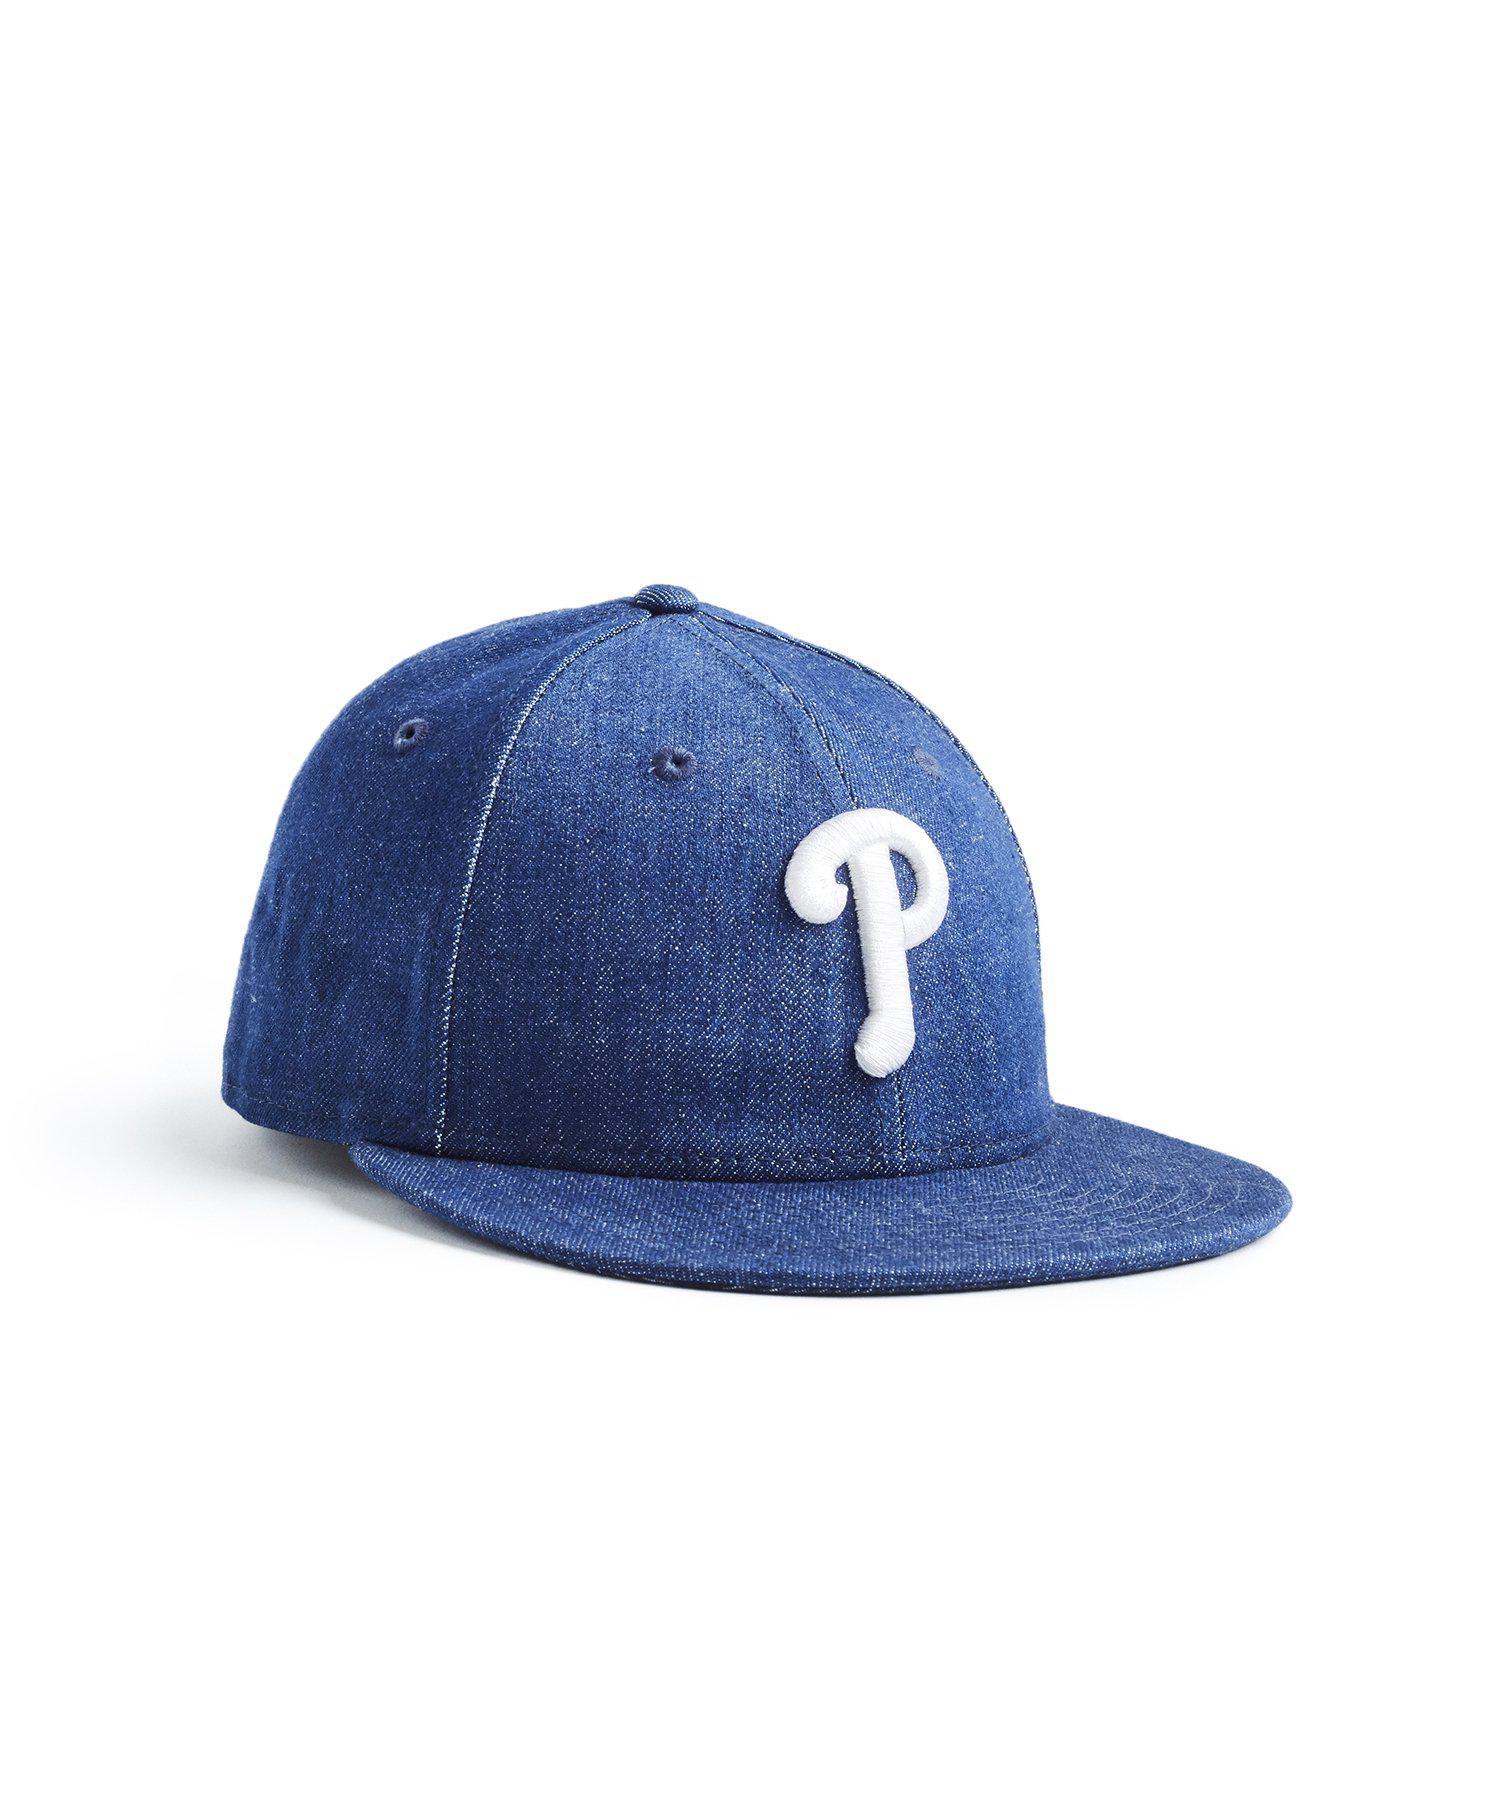 dc92f0e7797 Lyst - NEW ERA HATS Mlb Philadelphia Phillies Cap In Cone Denim in ...